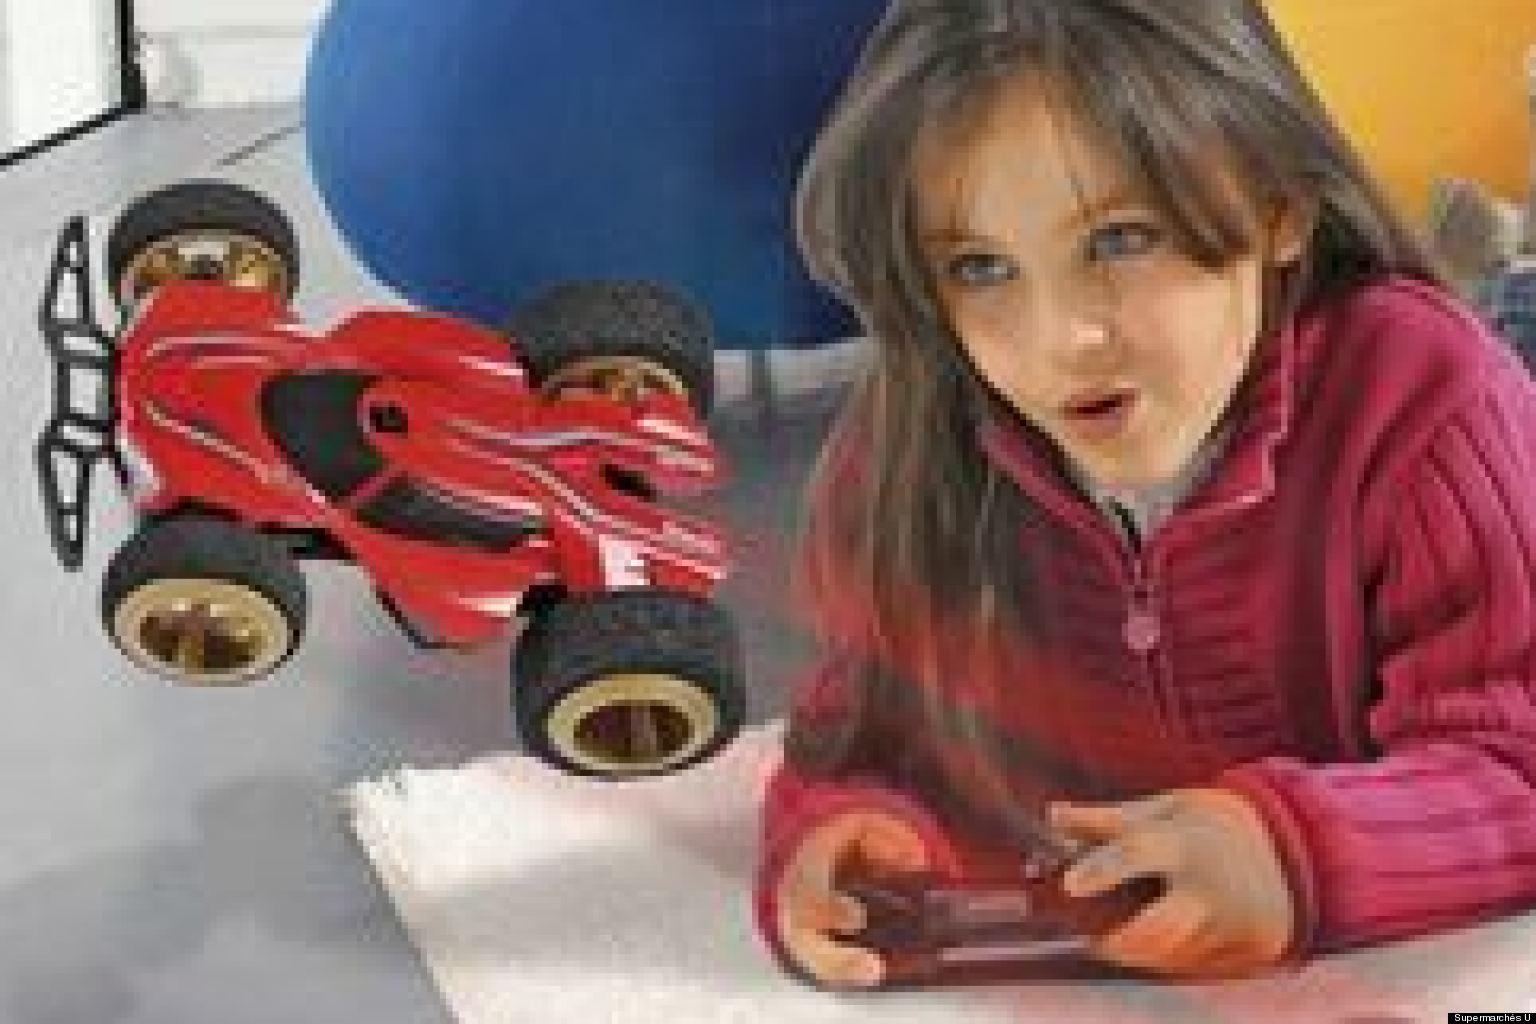 cadeaux de no l les supermarch s u proposent un catalogue de jouets au del des genres. Black Bedroom Furniture Sets. Home Design Ideas